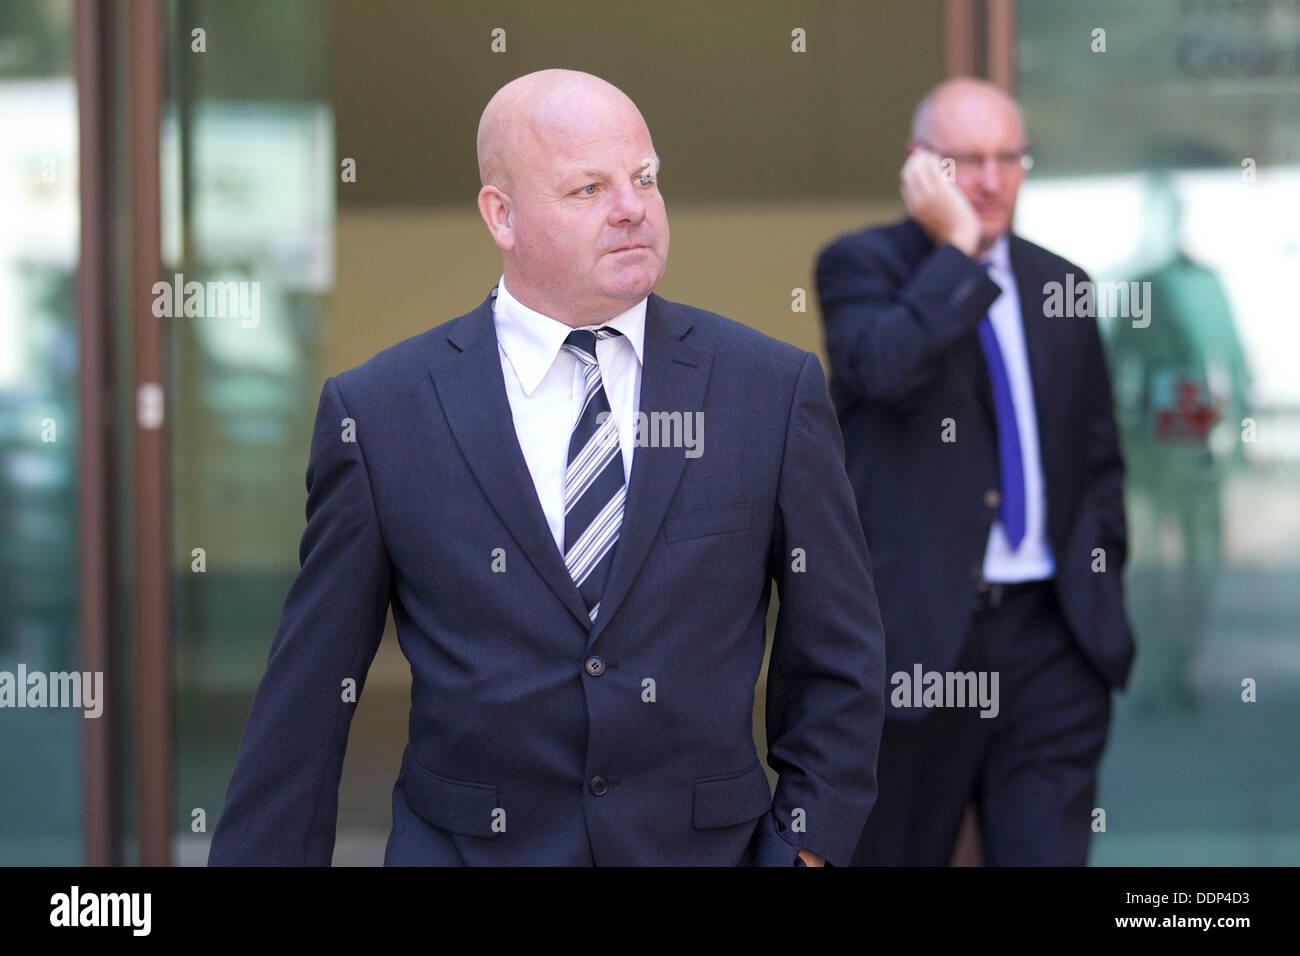 Westminster Magistrates Court LONDON, ENGLAND - SEPTEMBER 05: Sun journalist Jamie Pyatt leaves Westminster Magistrates Stock Photo